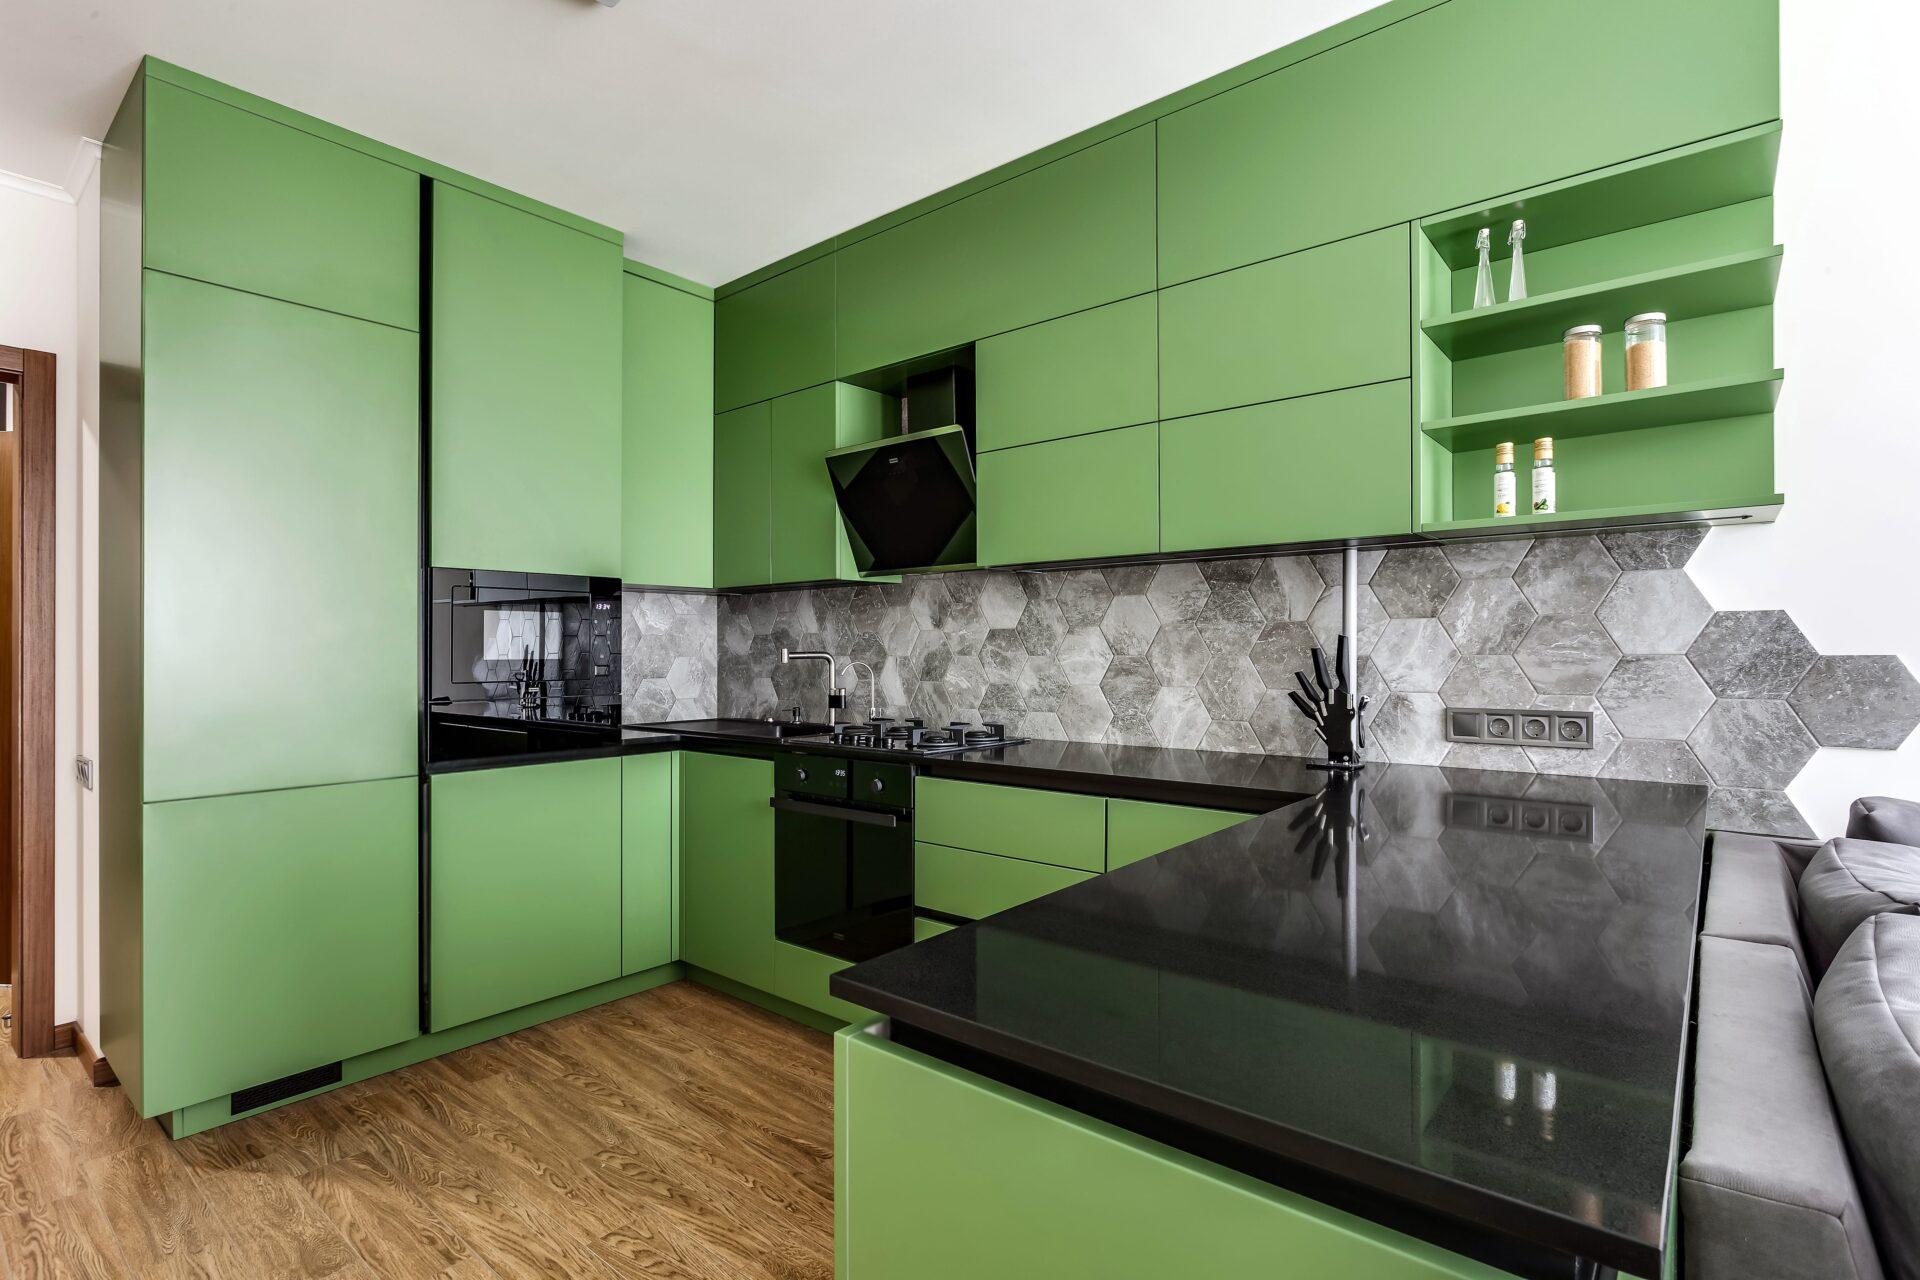 Green Mdf & Caesarstone